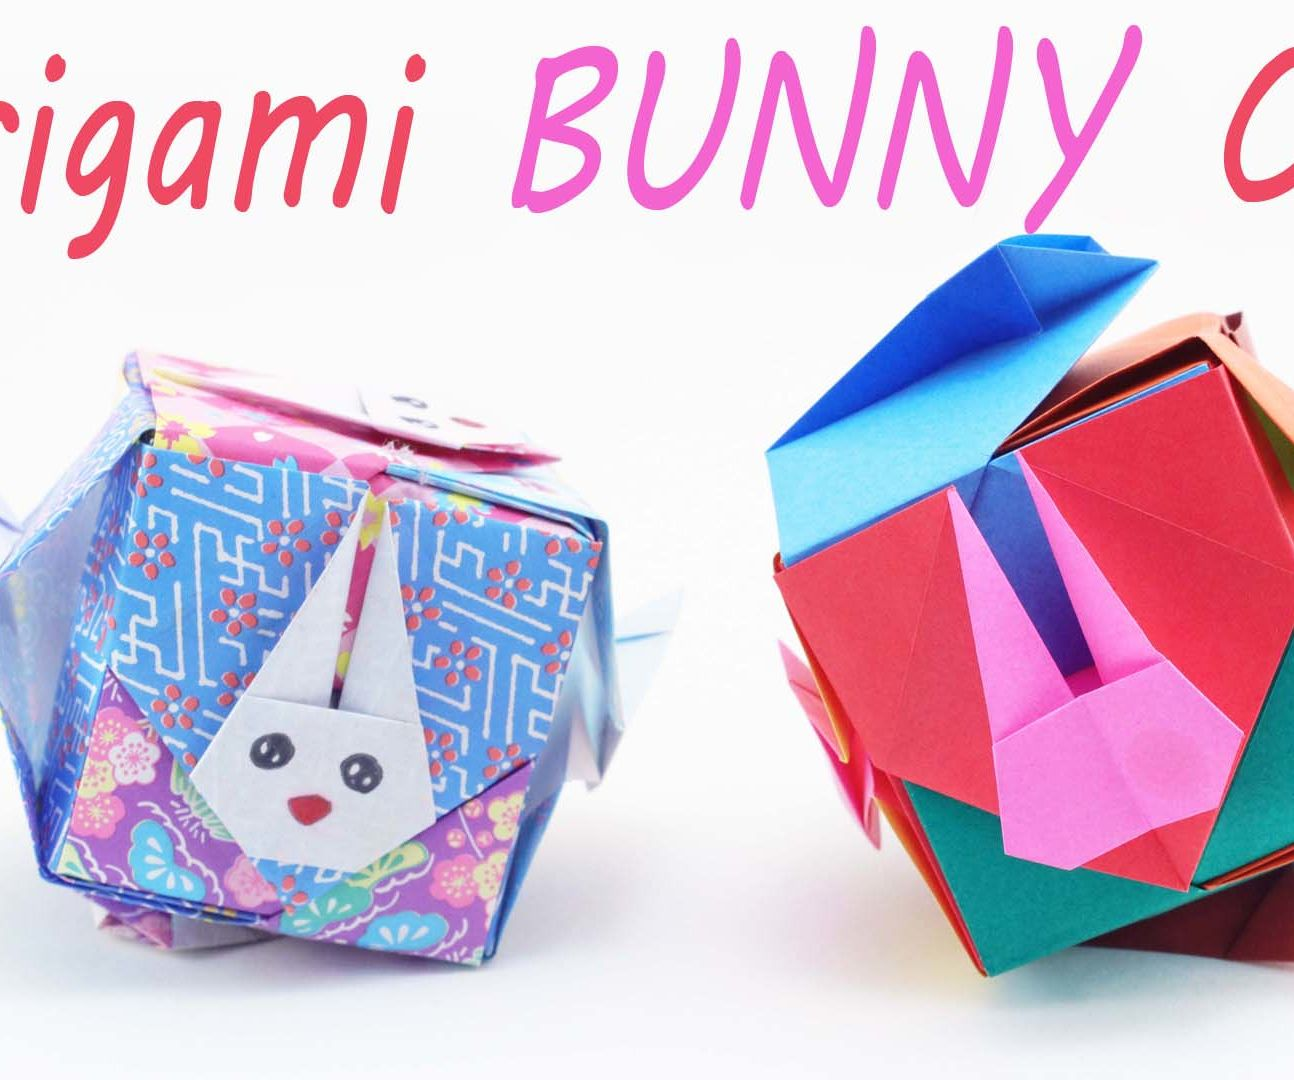 Origami Bunny Cube ✿ DIY Crafts Tutorial ✿ - SunderOrigami!